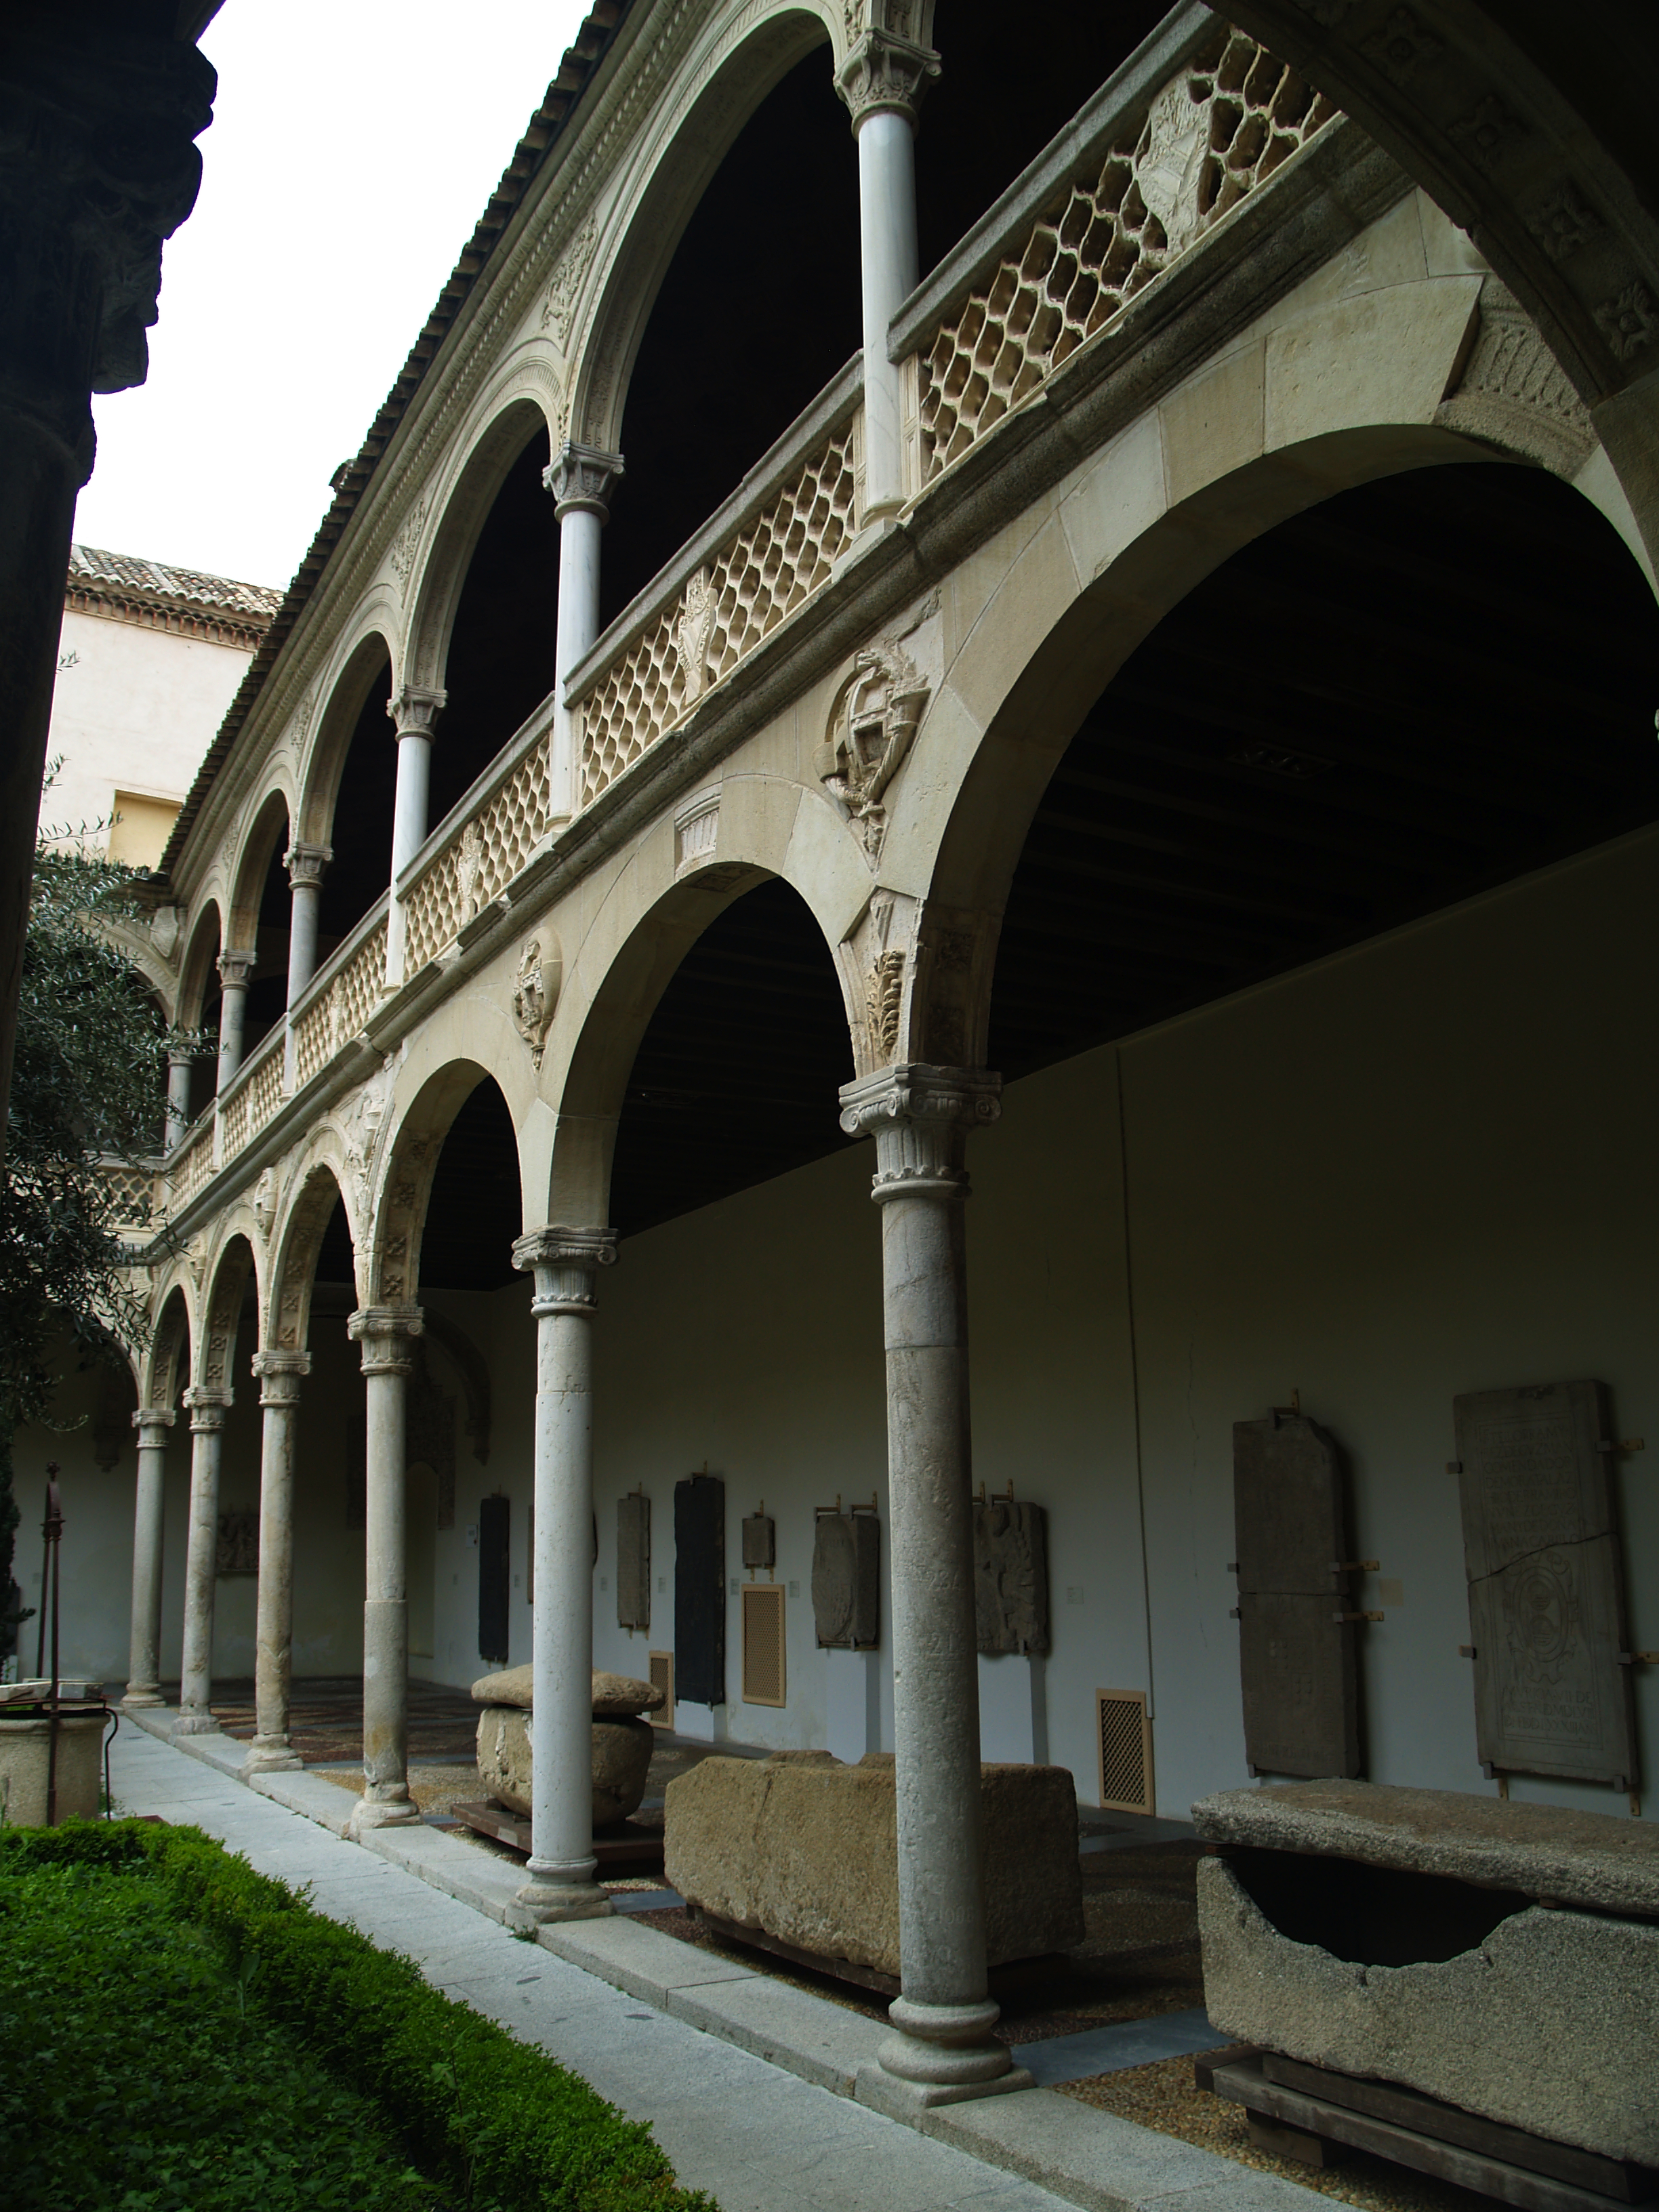 Museo De Santa Cruz.File Patio Museo De Santa Cruz 08 Jpg Wikimedia Commons